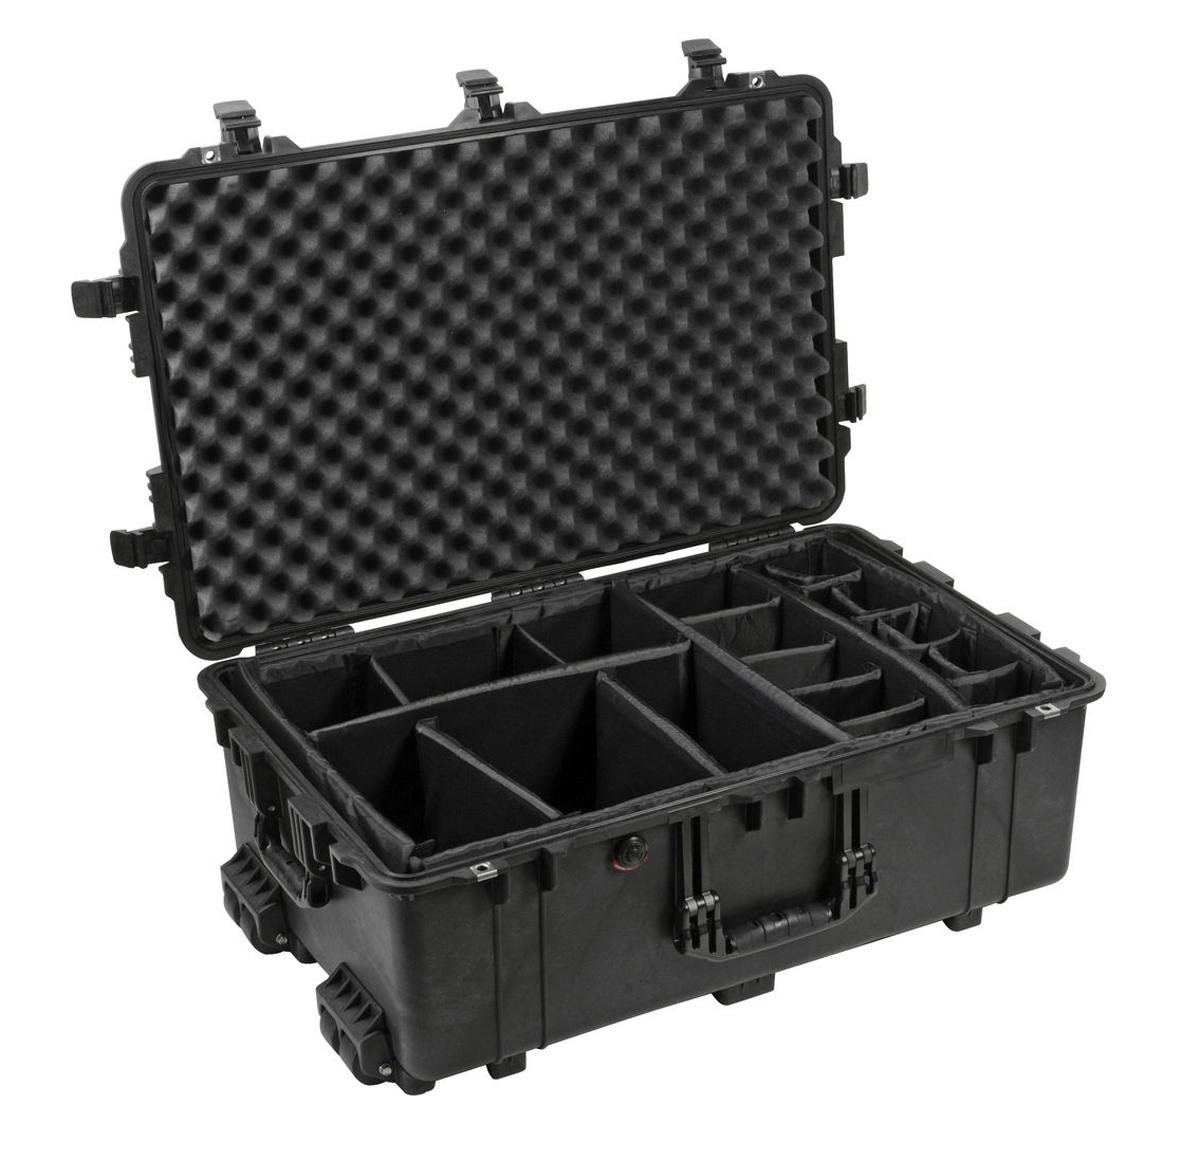 pelican 1650b watertight hard case w padded dividers wheels black ebay. Black Bedroom Furniture Sets. Home Design Ideas